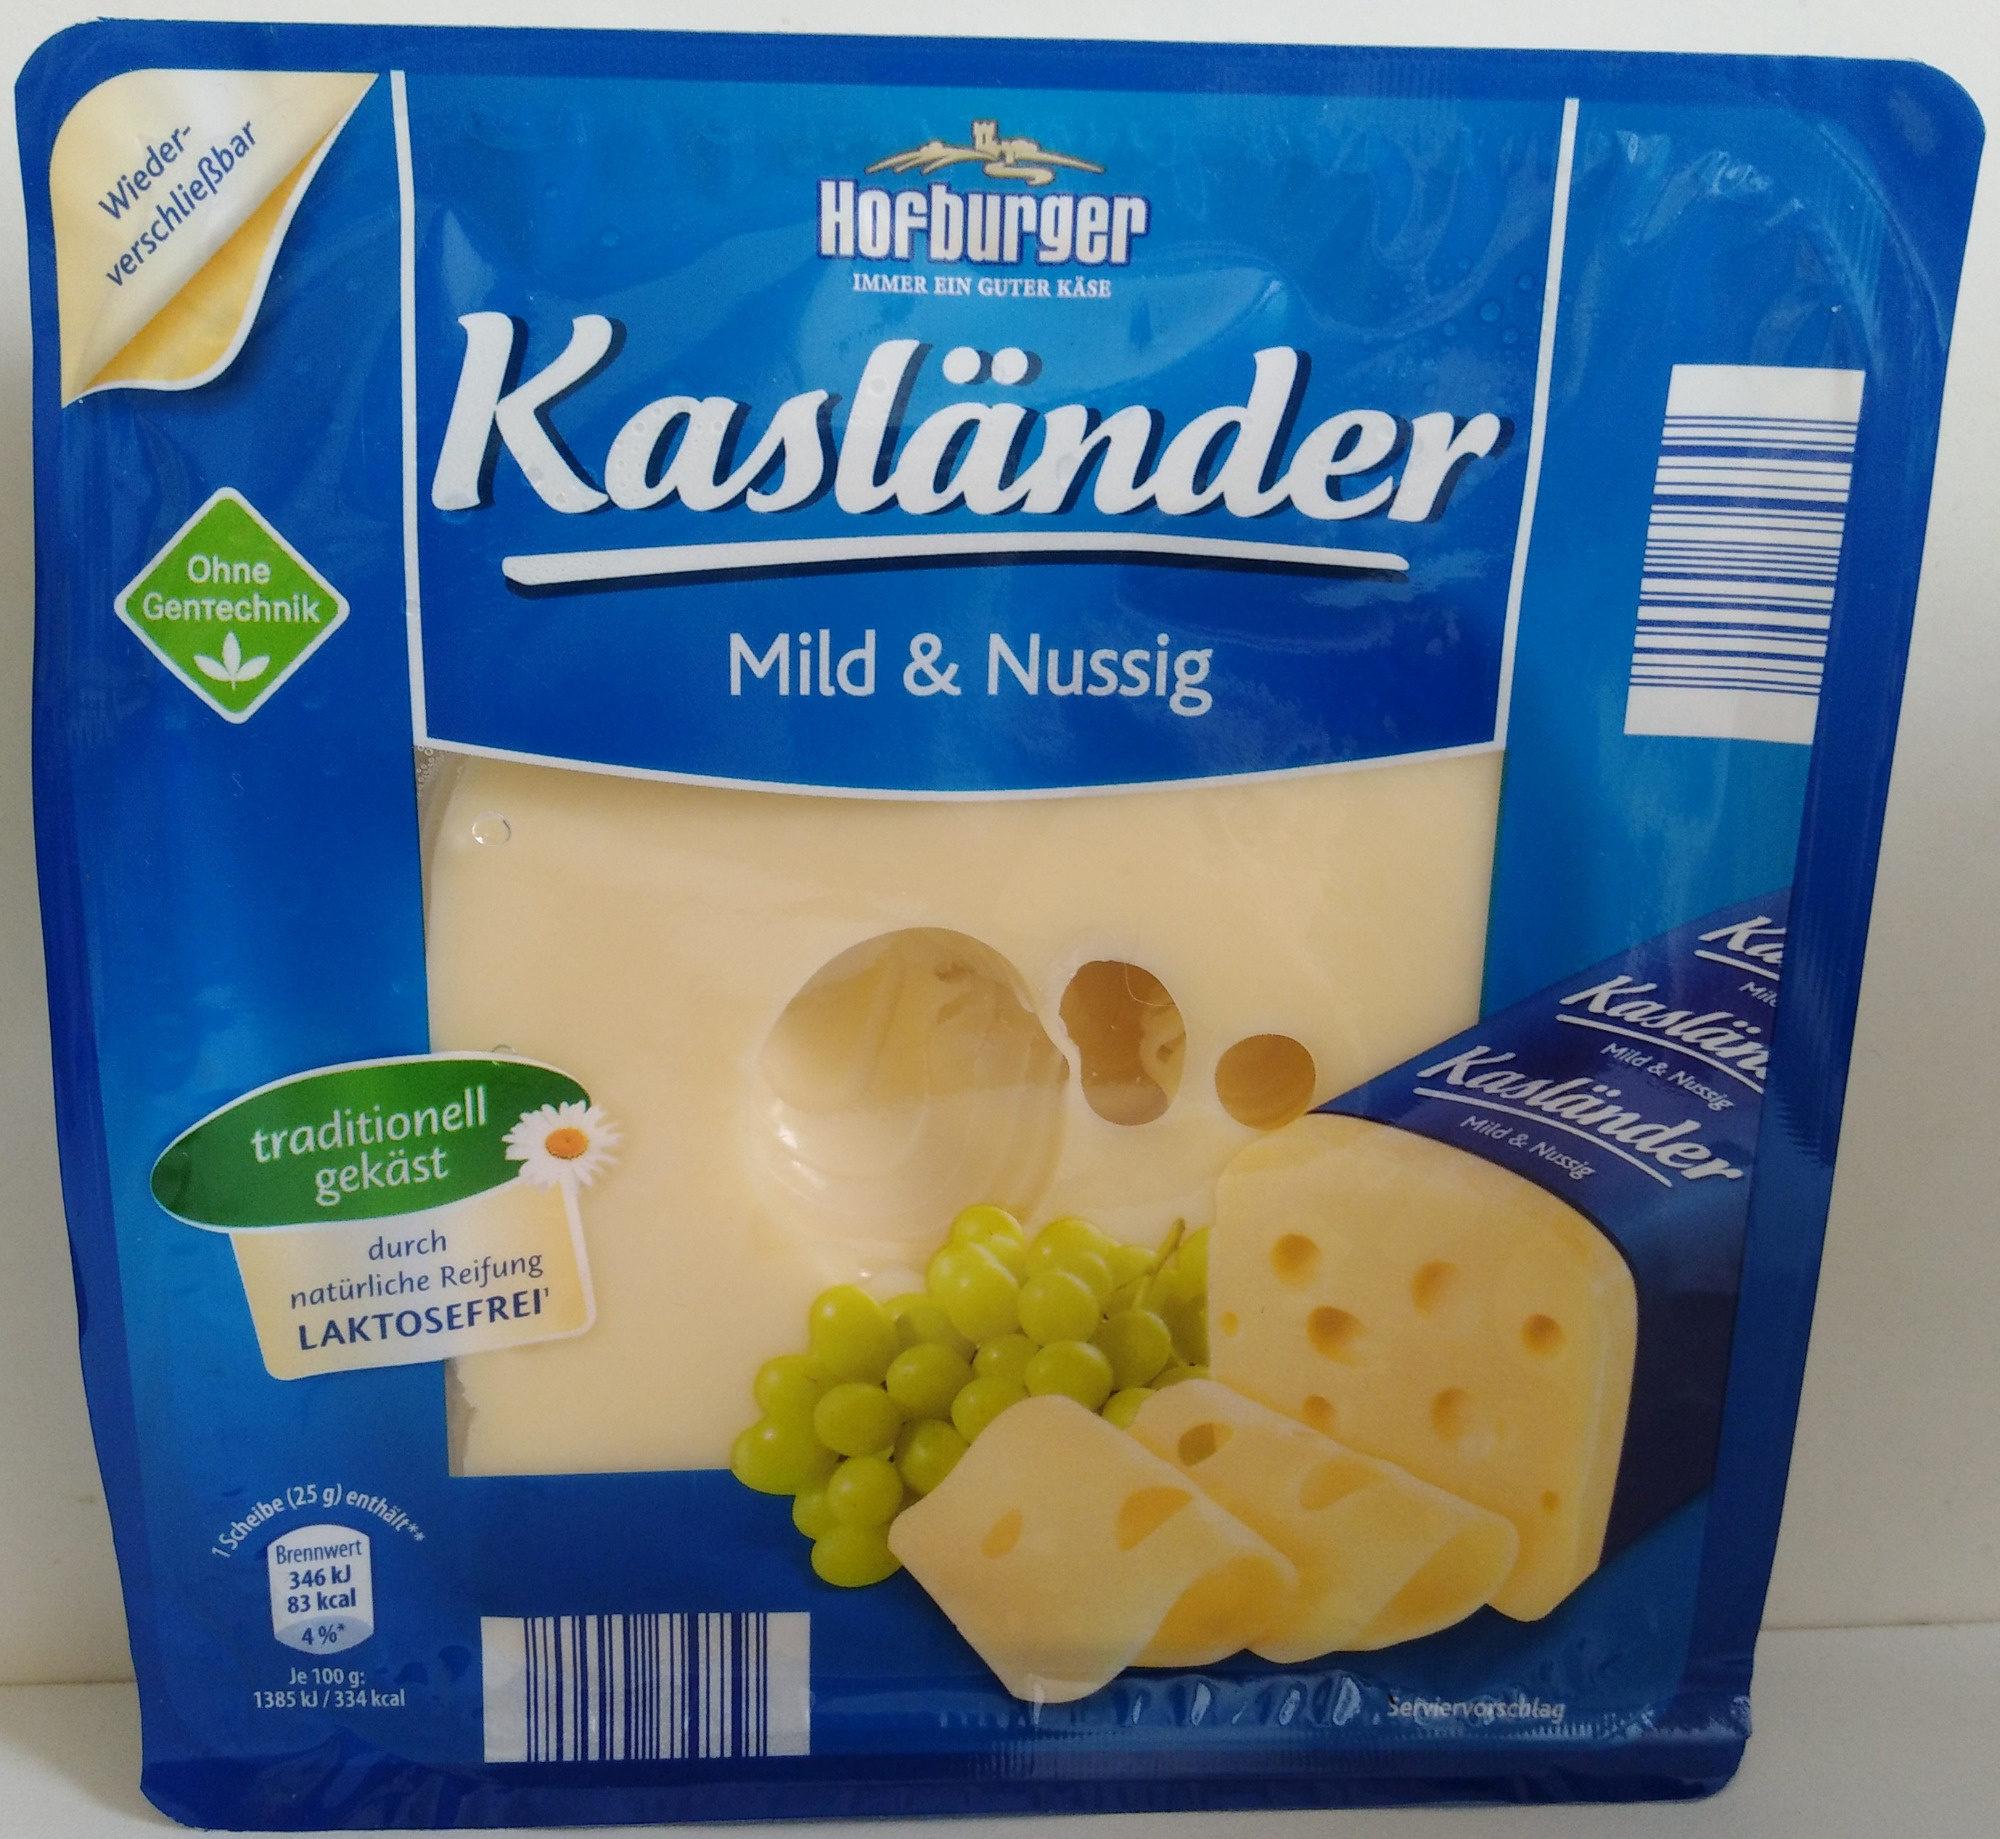 Kasländer Mild & Nussig — Hofburger — 200 g